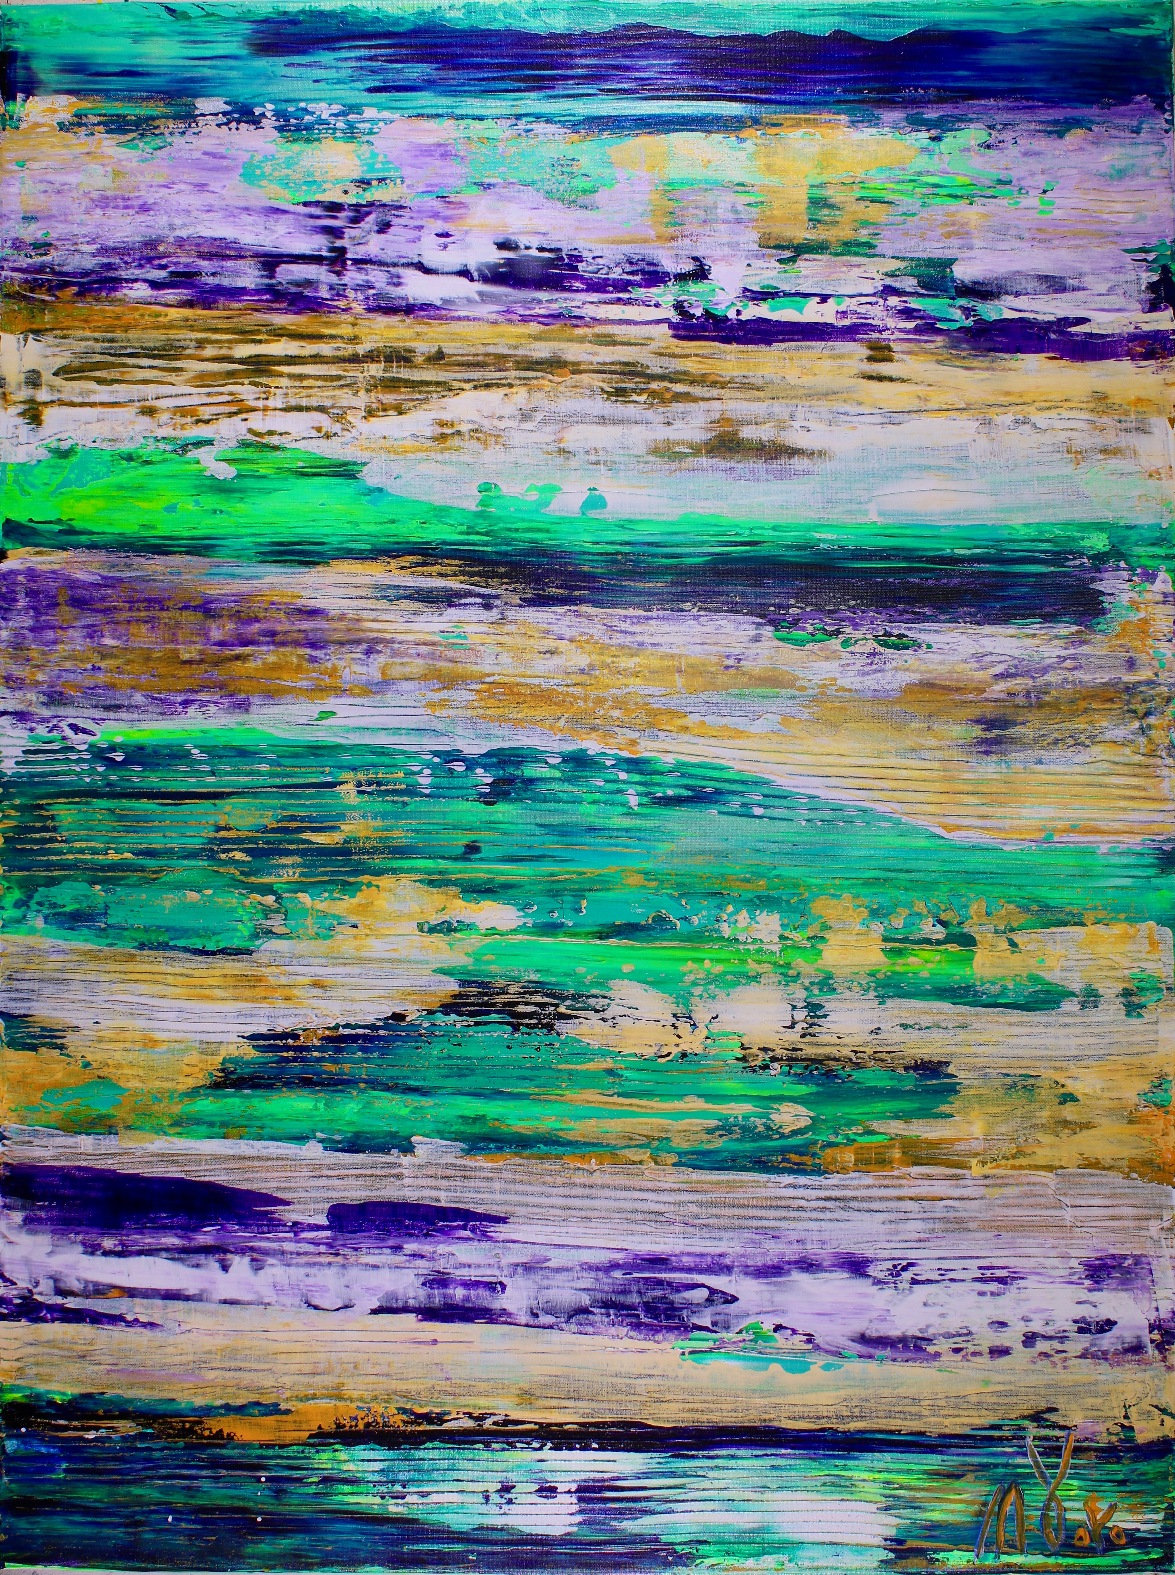 Boundless Terrain (2017) Edit Acrylic painting by Nestor Toro